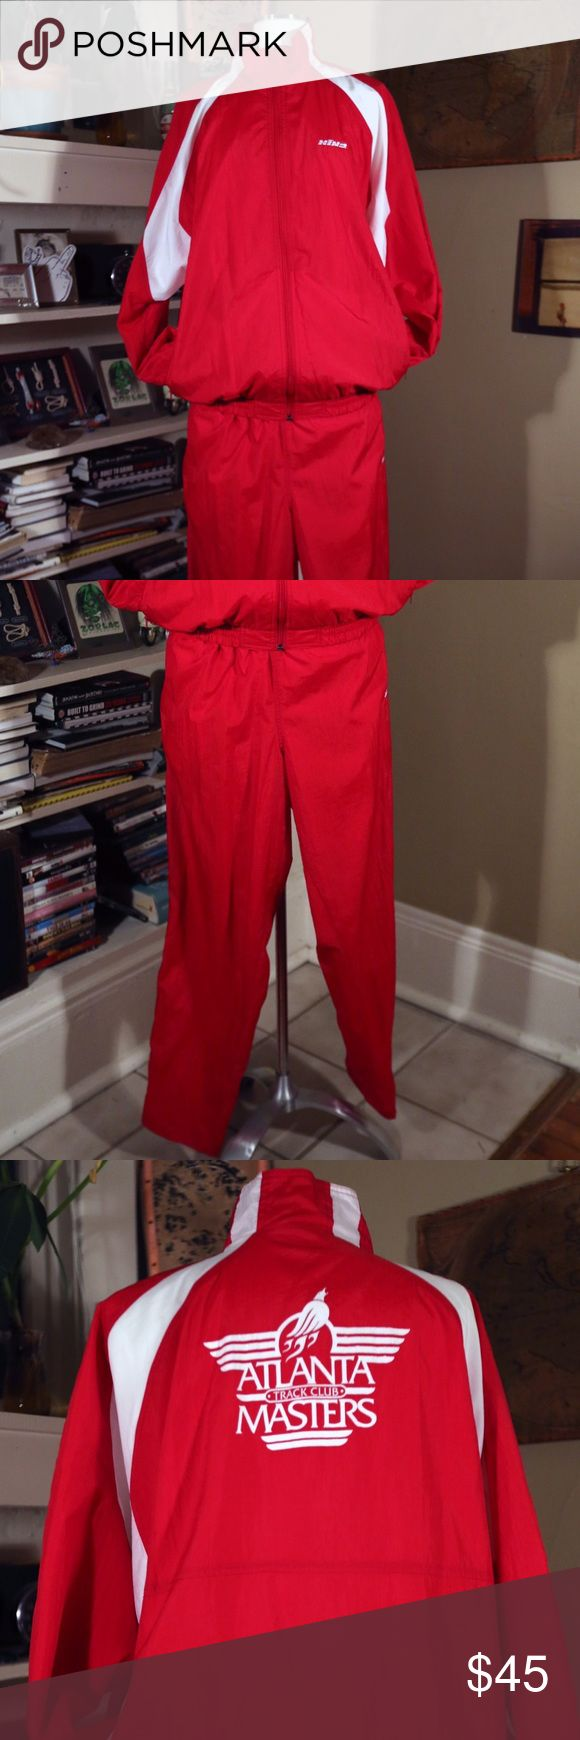 *VINTAGE* UNISEX ATLANTA TRACK MASTERS TRACK SUIT Authentic 1990's RED ATLANTA TRACK MASTERS TRACK SUIT - matching pants and jacket! LIKE BRAND NEW -- TRUE TO SIZE. 100% NYLON. Hind Pants Track Pants & Joggers